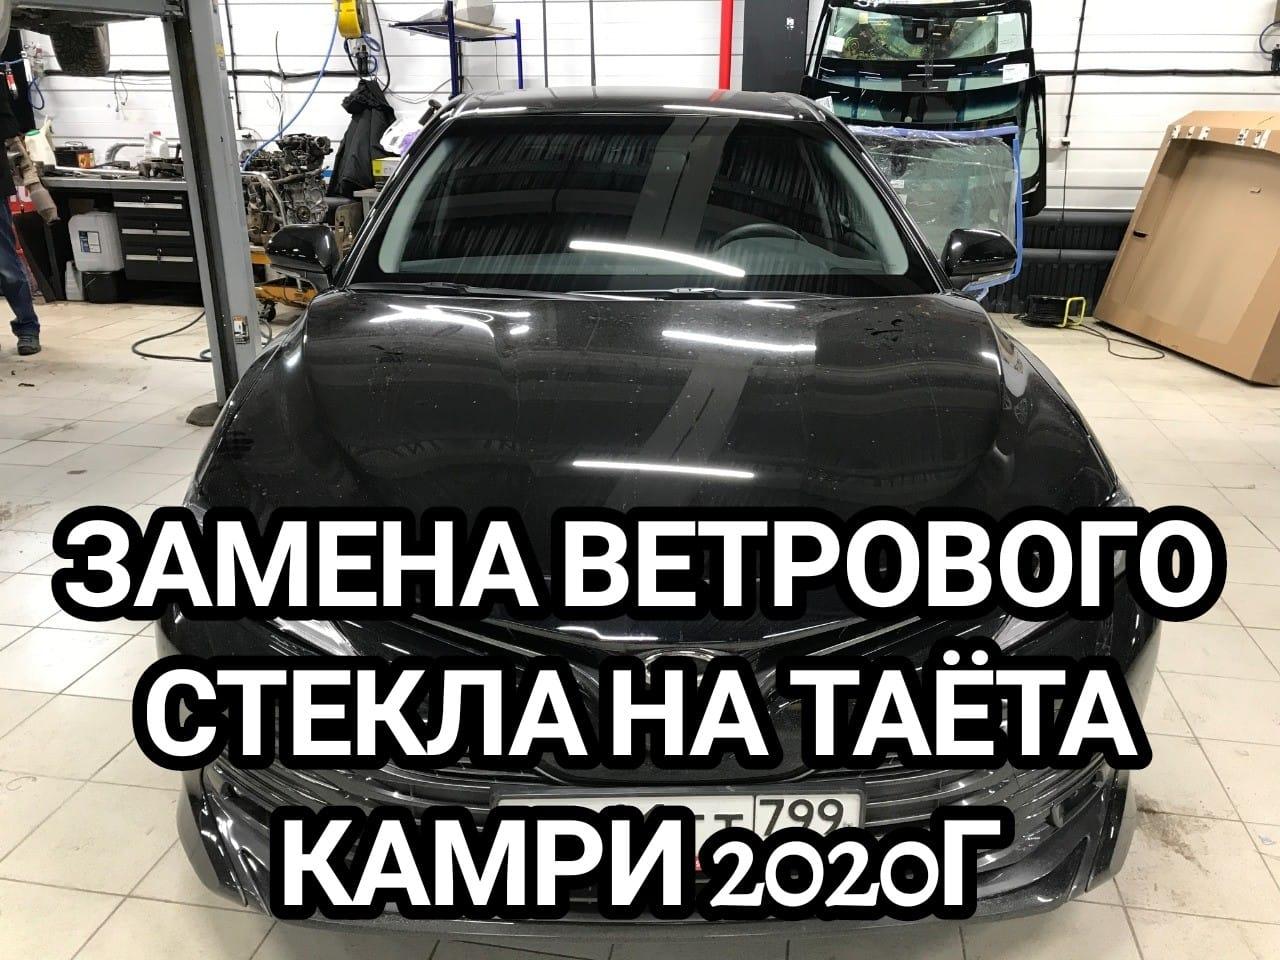 Замена ветрового стекла на ТАЁТА КАМРИ 2020г